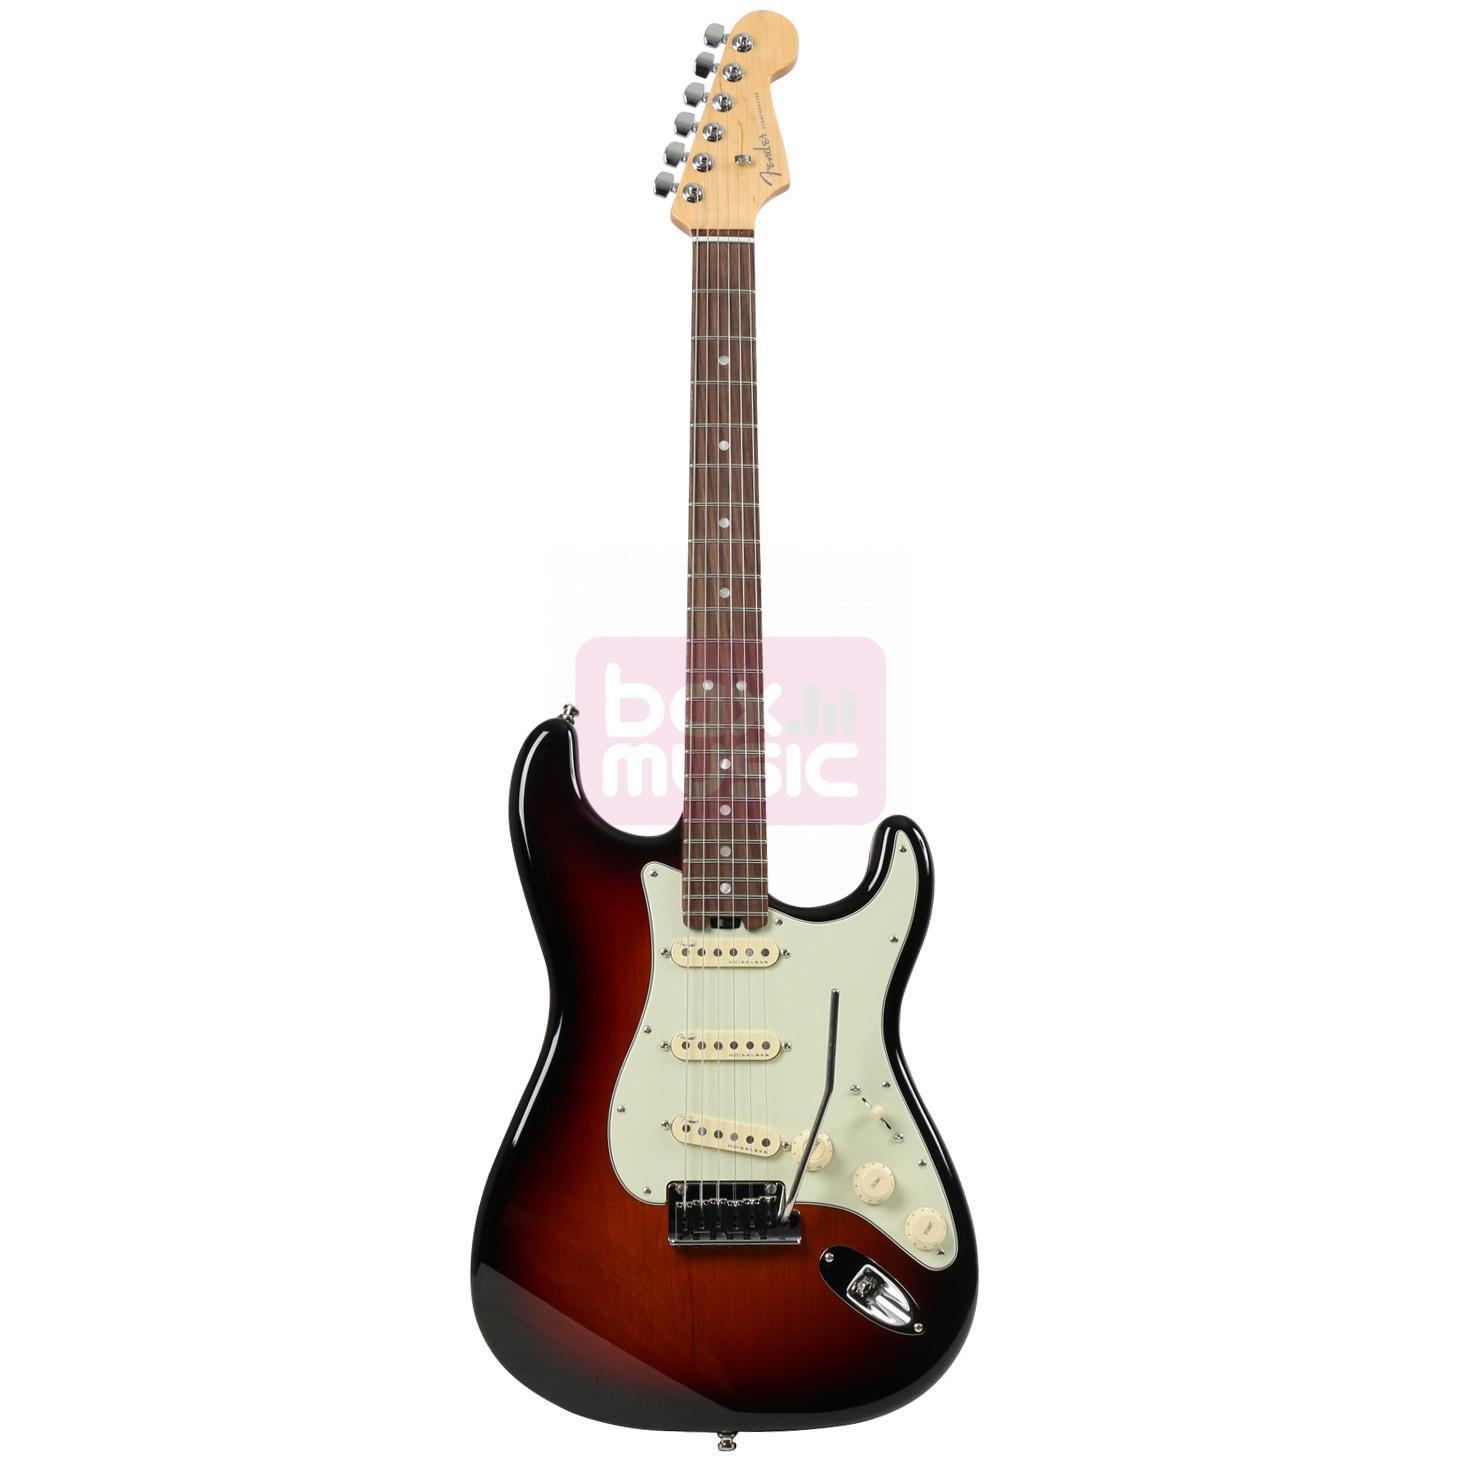 Fender American Elite Stratocaster 3-Tone Sunburst RW